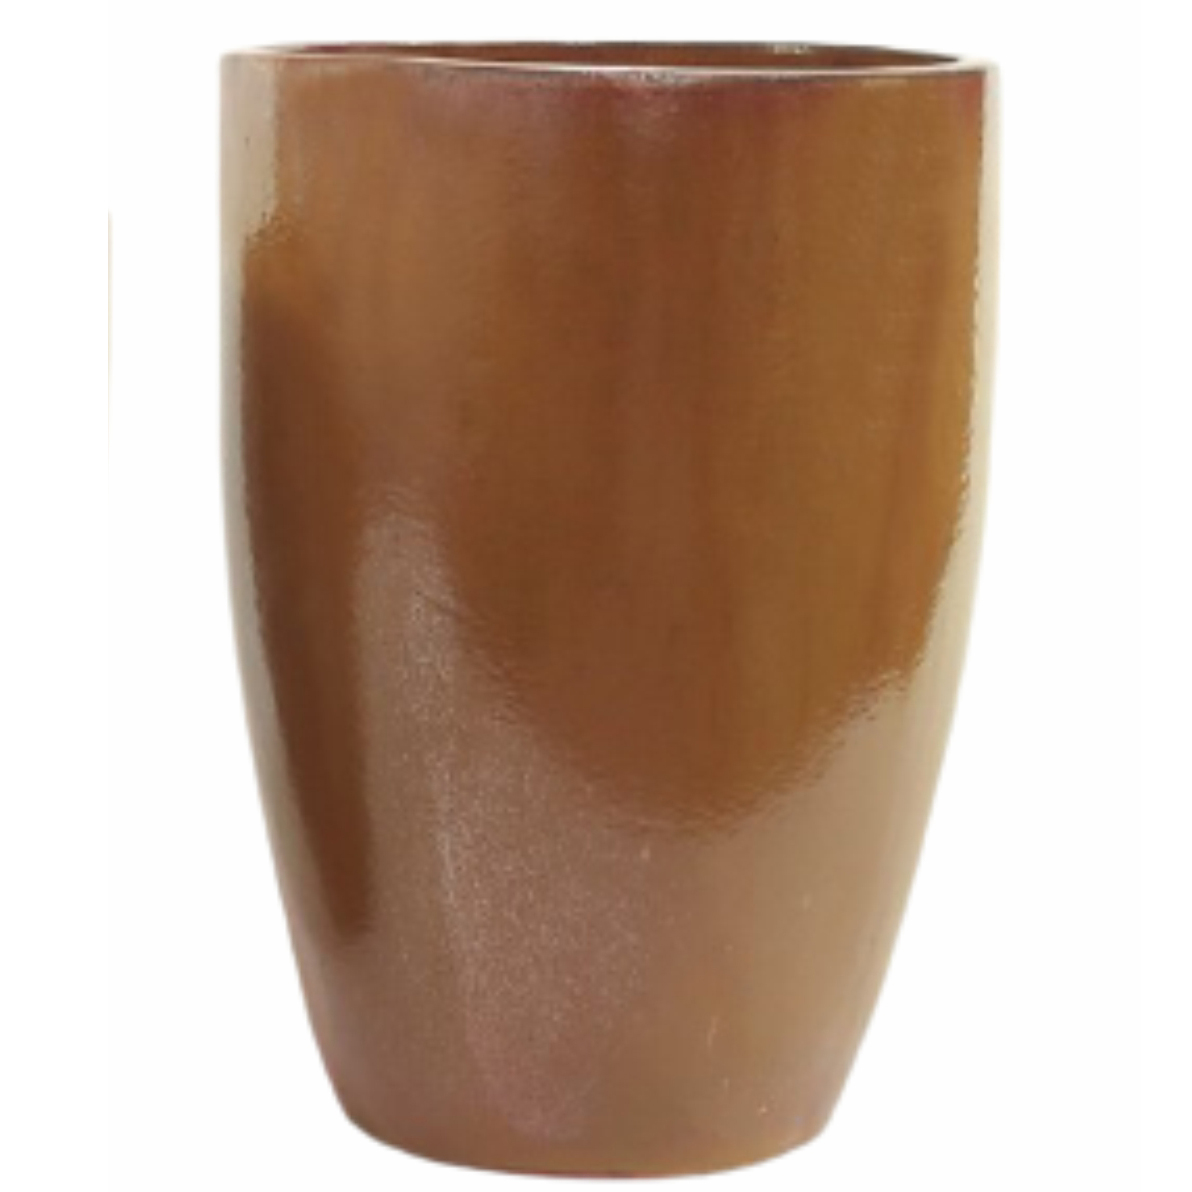 Vaso de Cerâmica Artesanal Cobre Liv 35x51cm